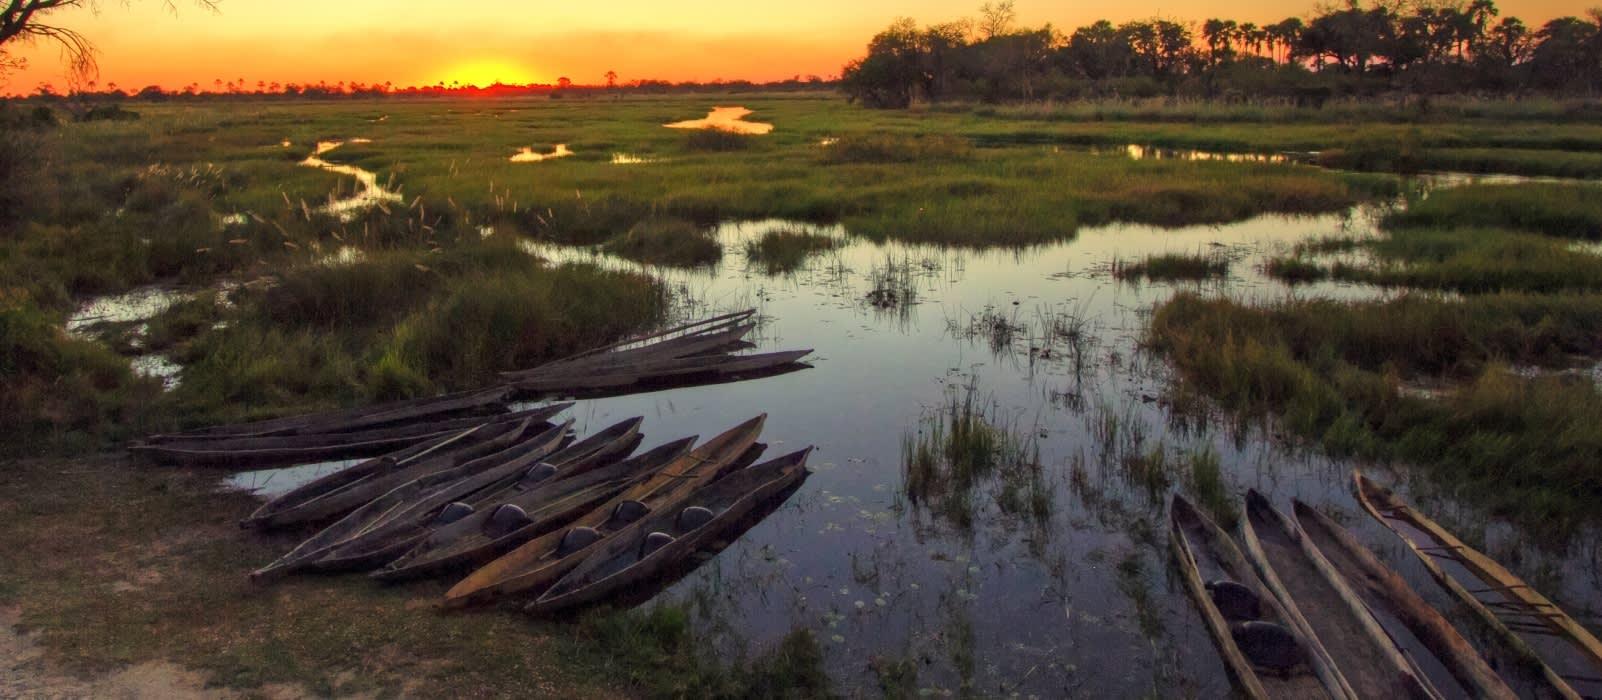 Mokoro Einbaum-Boote im Okavango-Delta